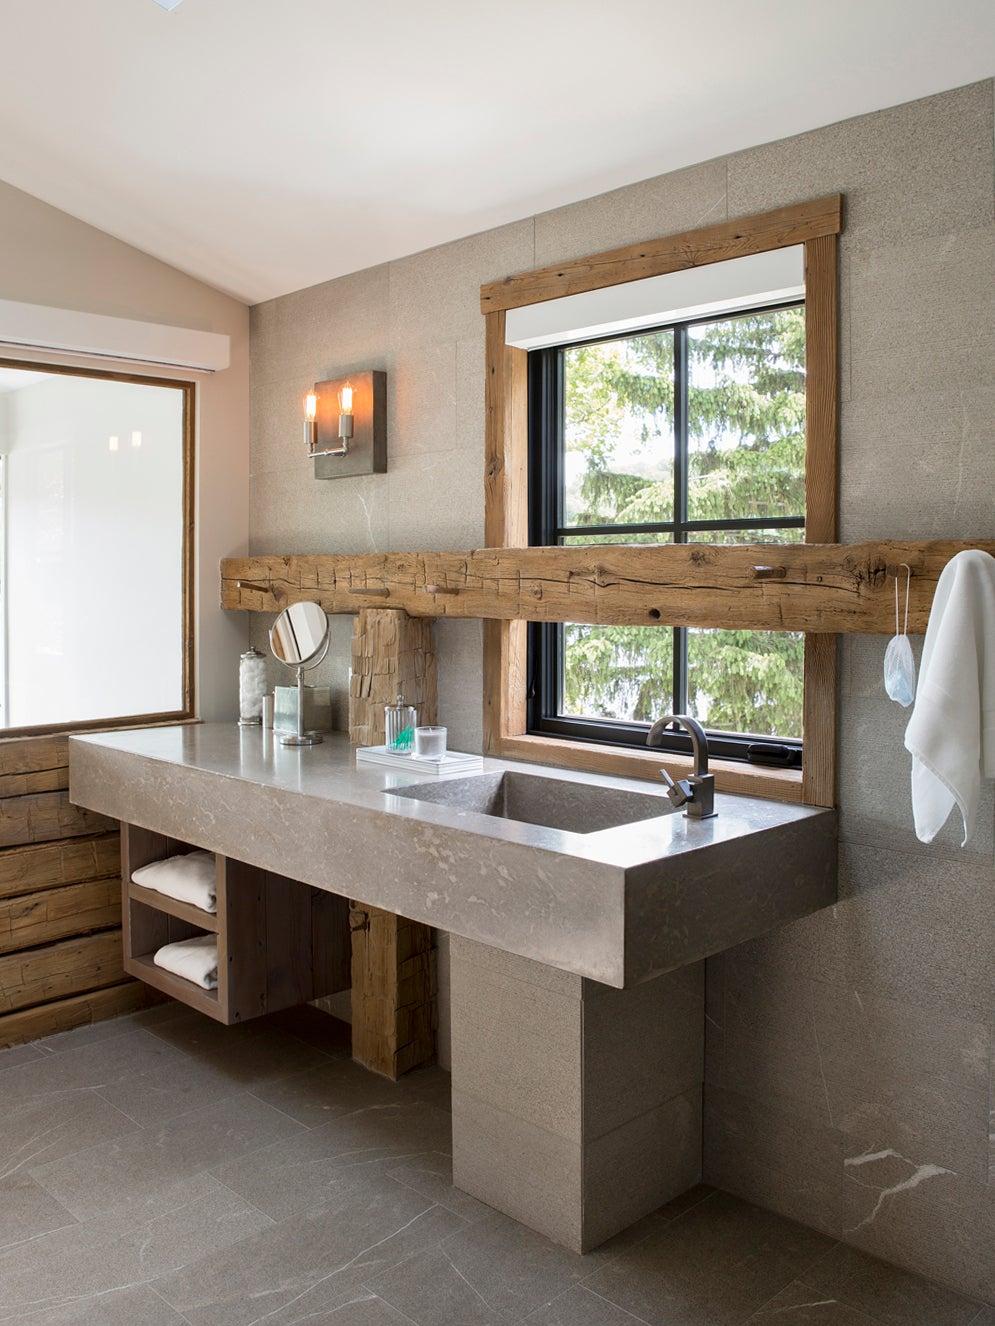 00-FEATURE-exposed-beam-bathroom-renovation-domino